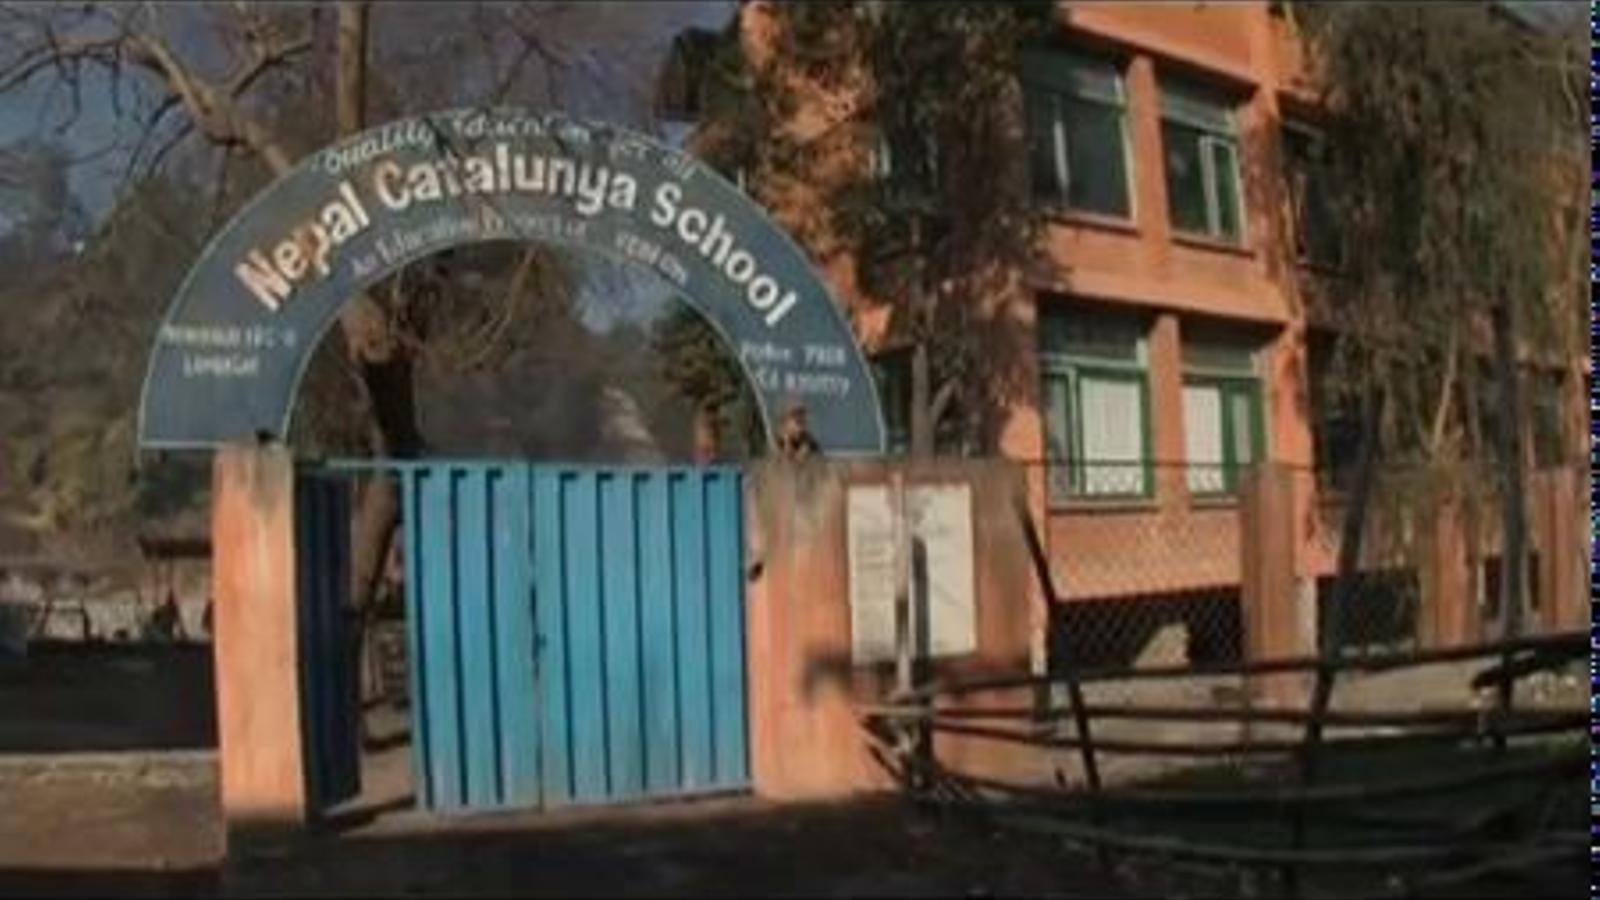 Visita a la 'Nepal Catalunya School'